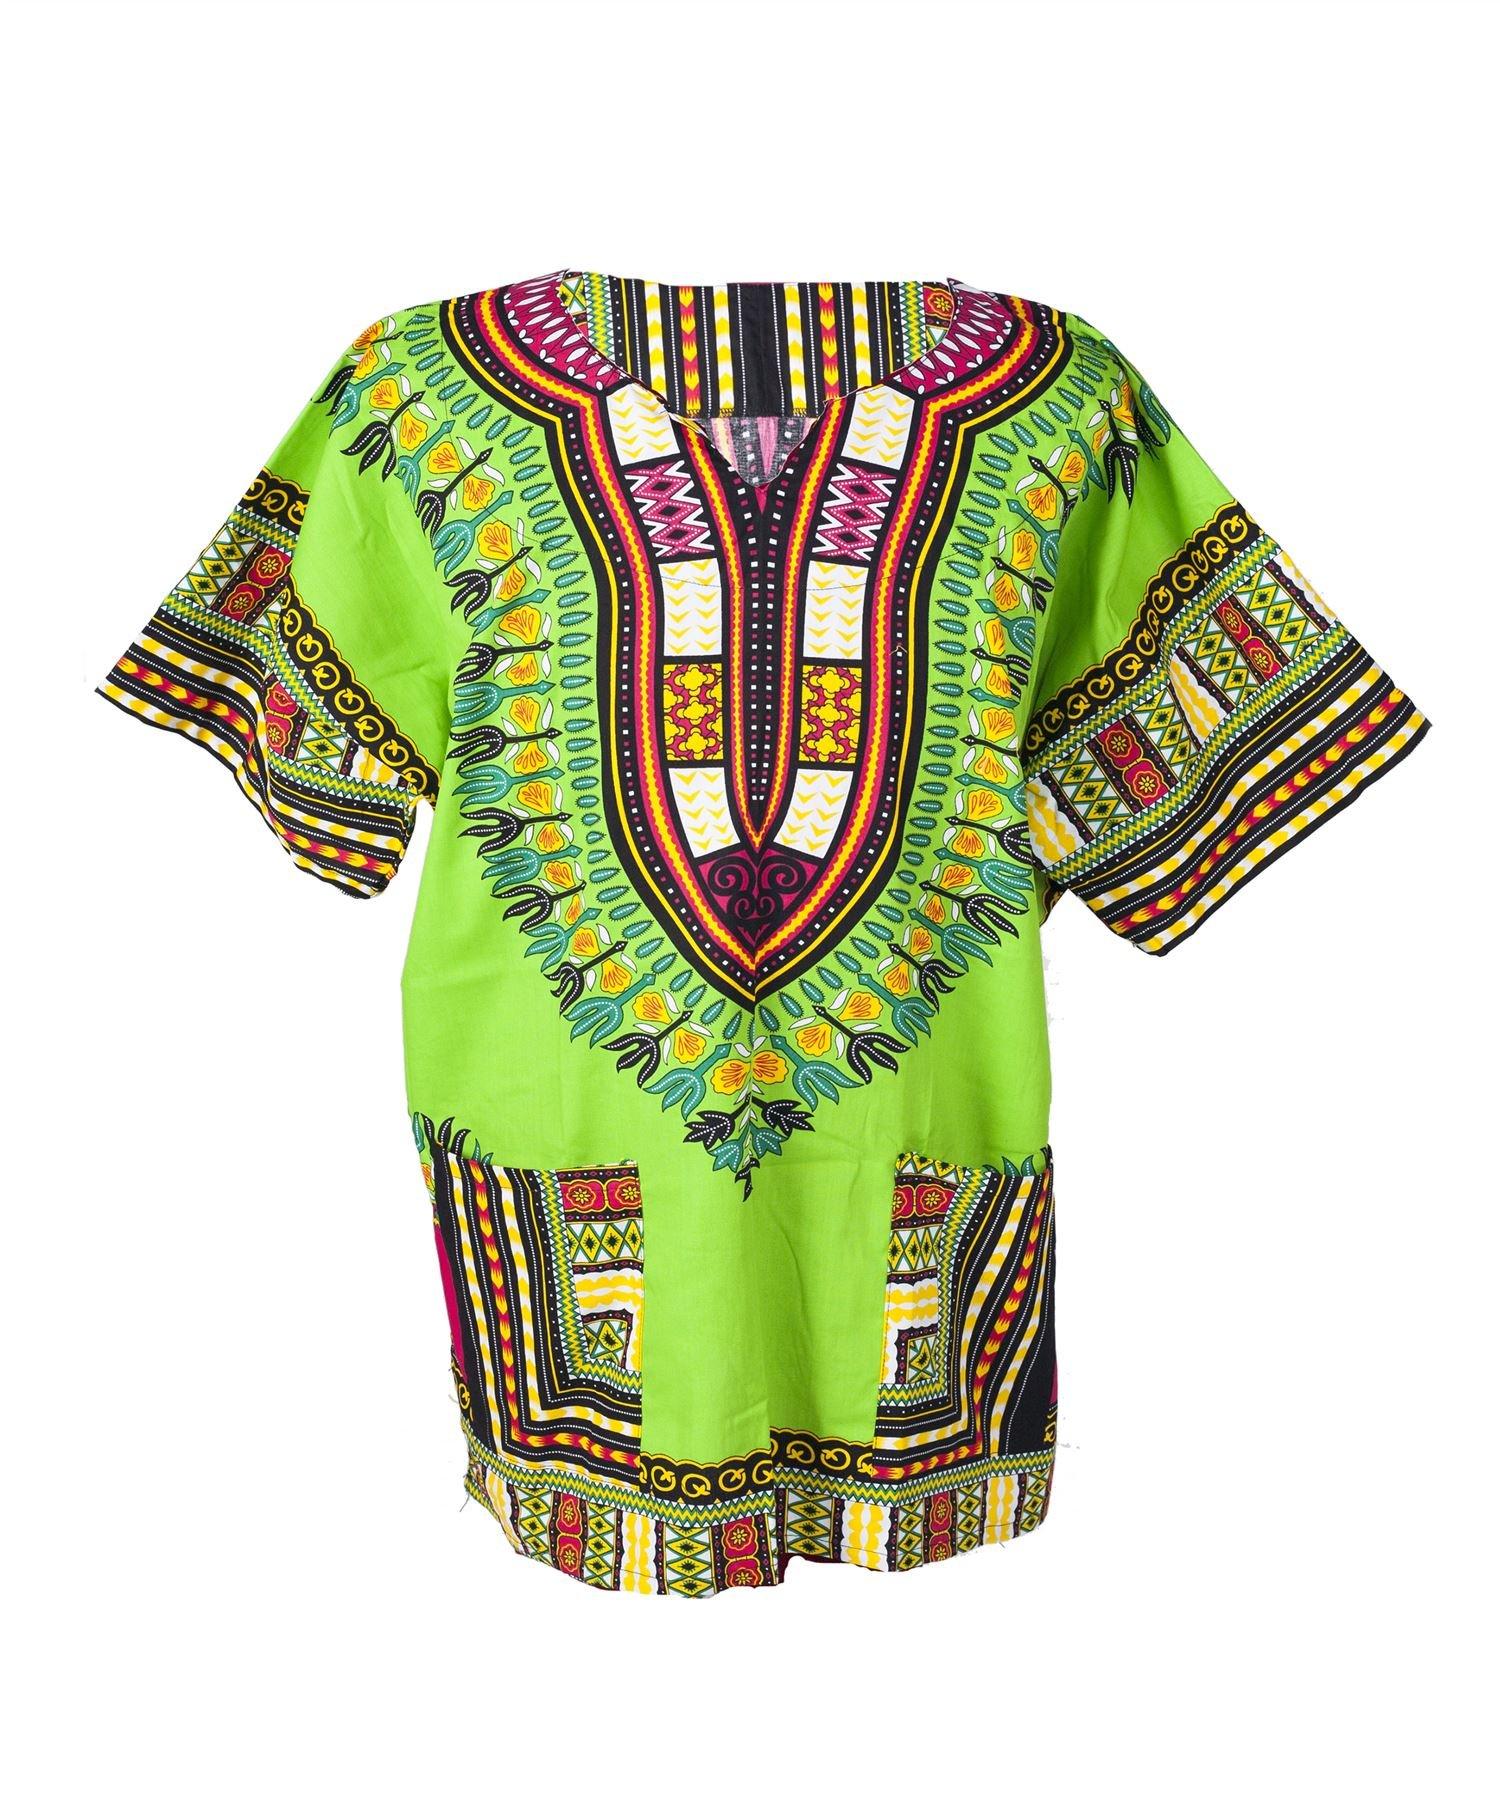 22c1745a7f7 Lofbaz Traditional African Print Unisex Dashiki Size L Light Green ...